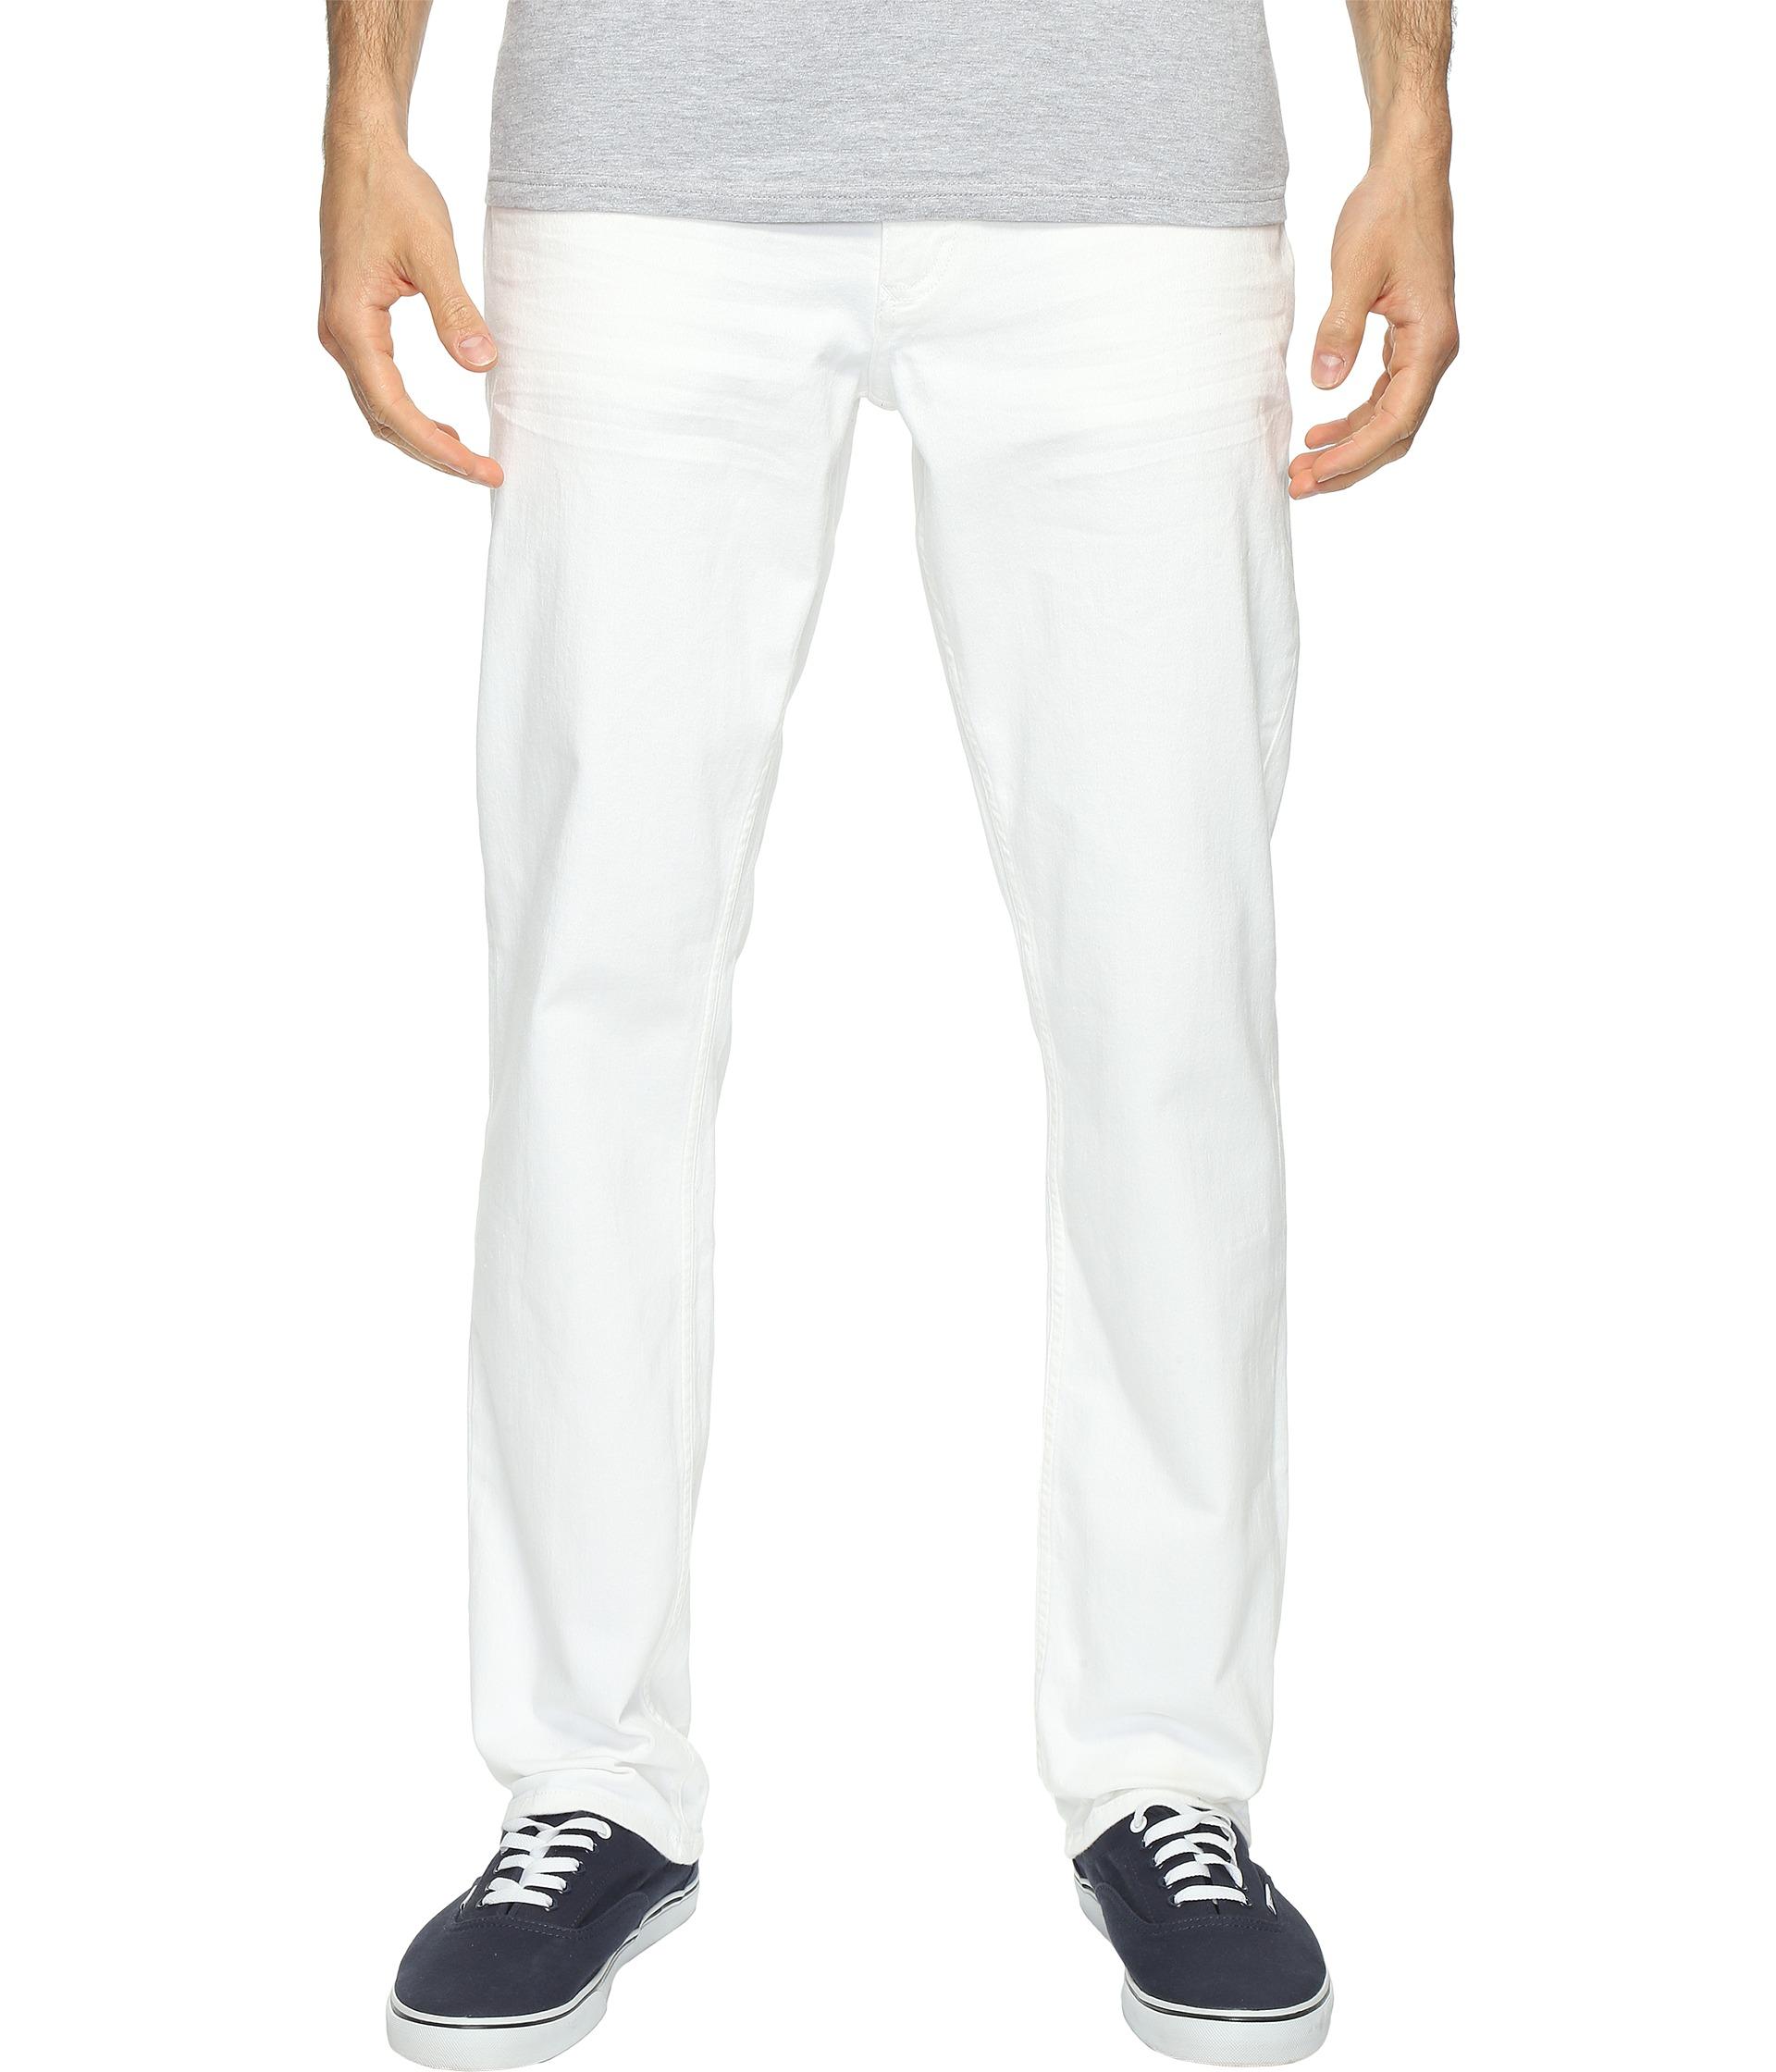 calvin klein jeans slim straight jeans in white wash white. Black Bedroom Furniture Sets. Home Design Ideas